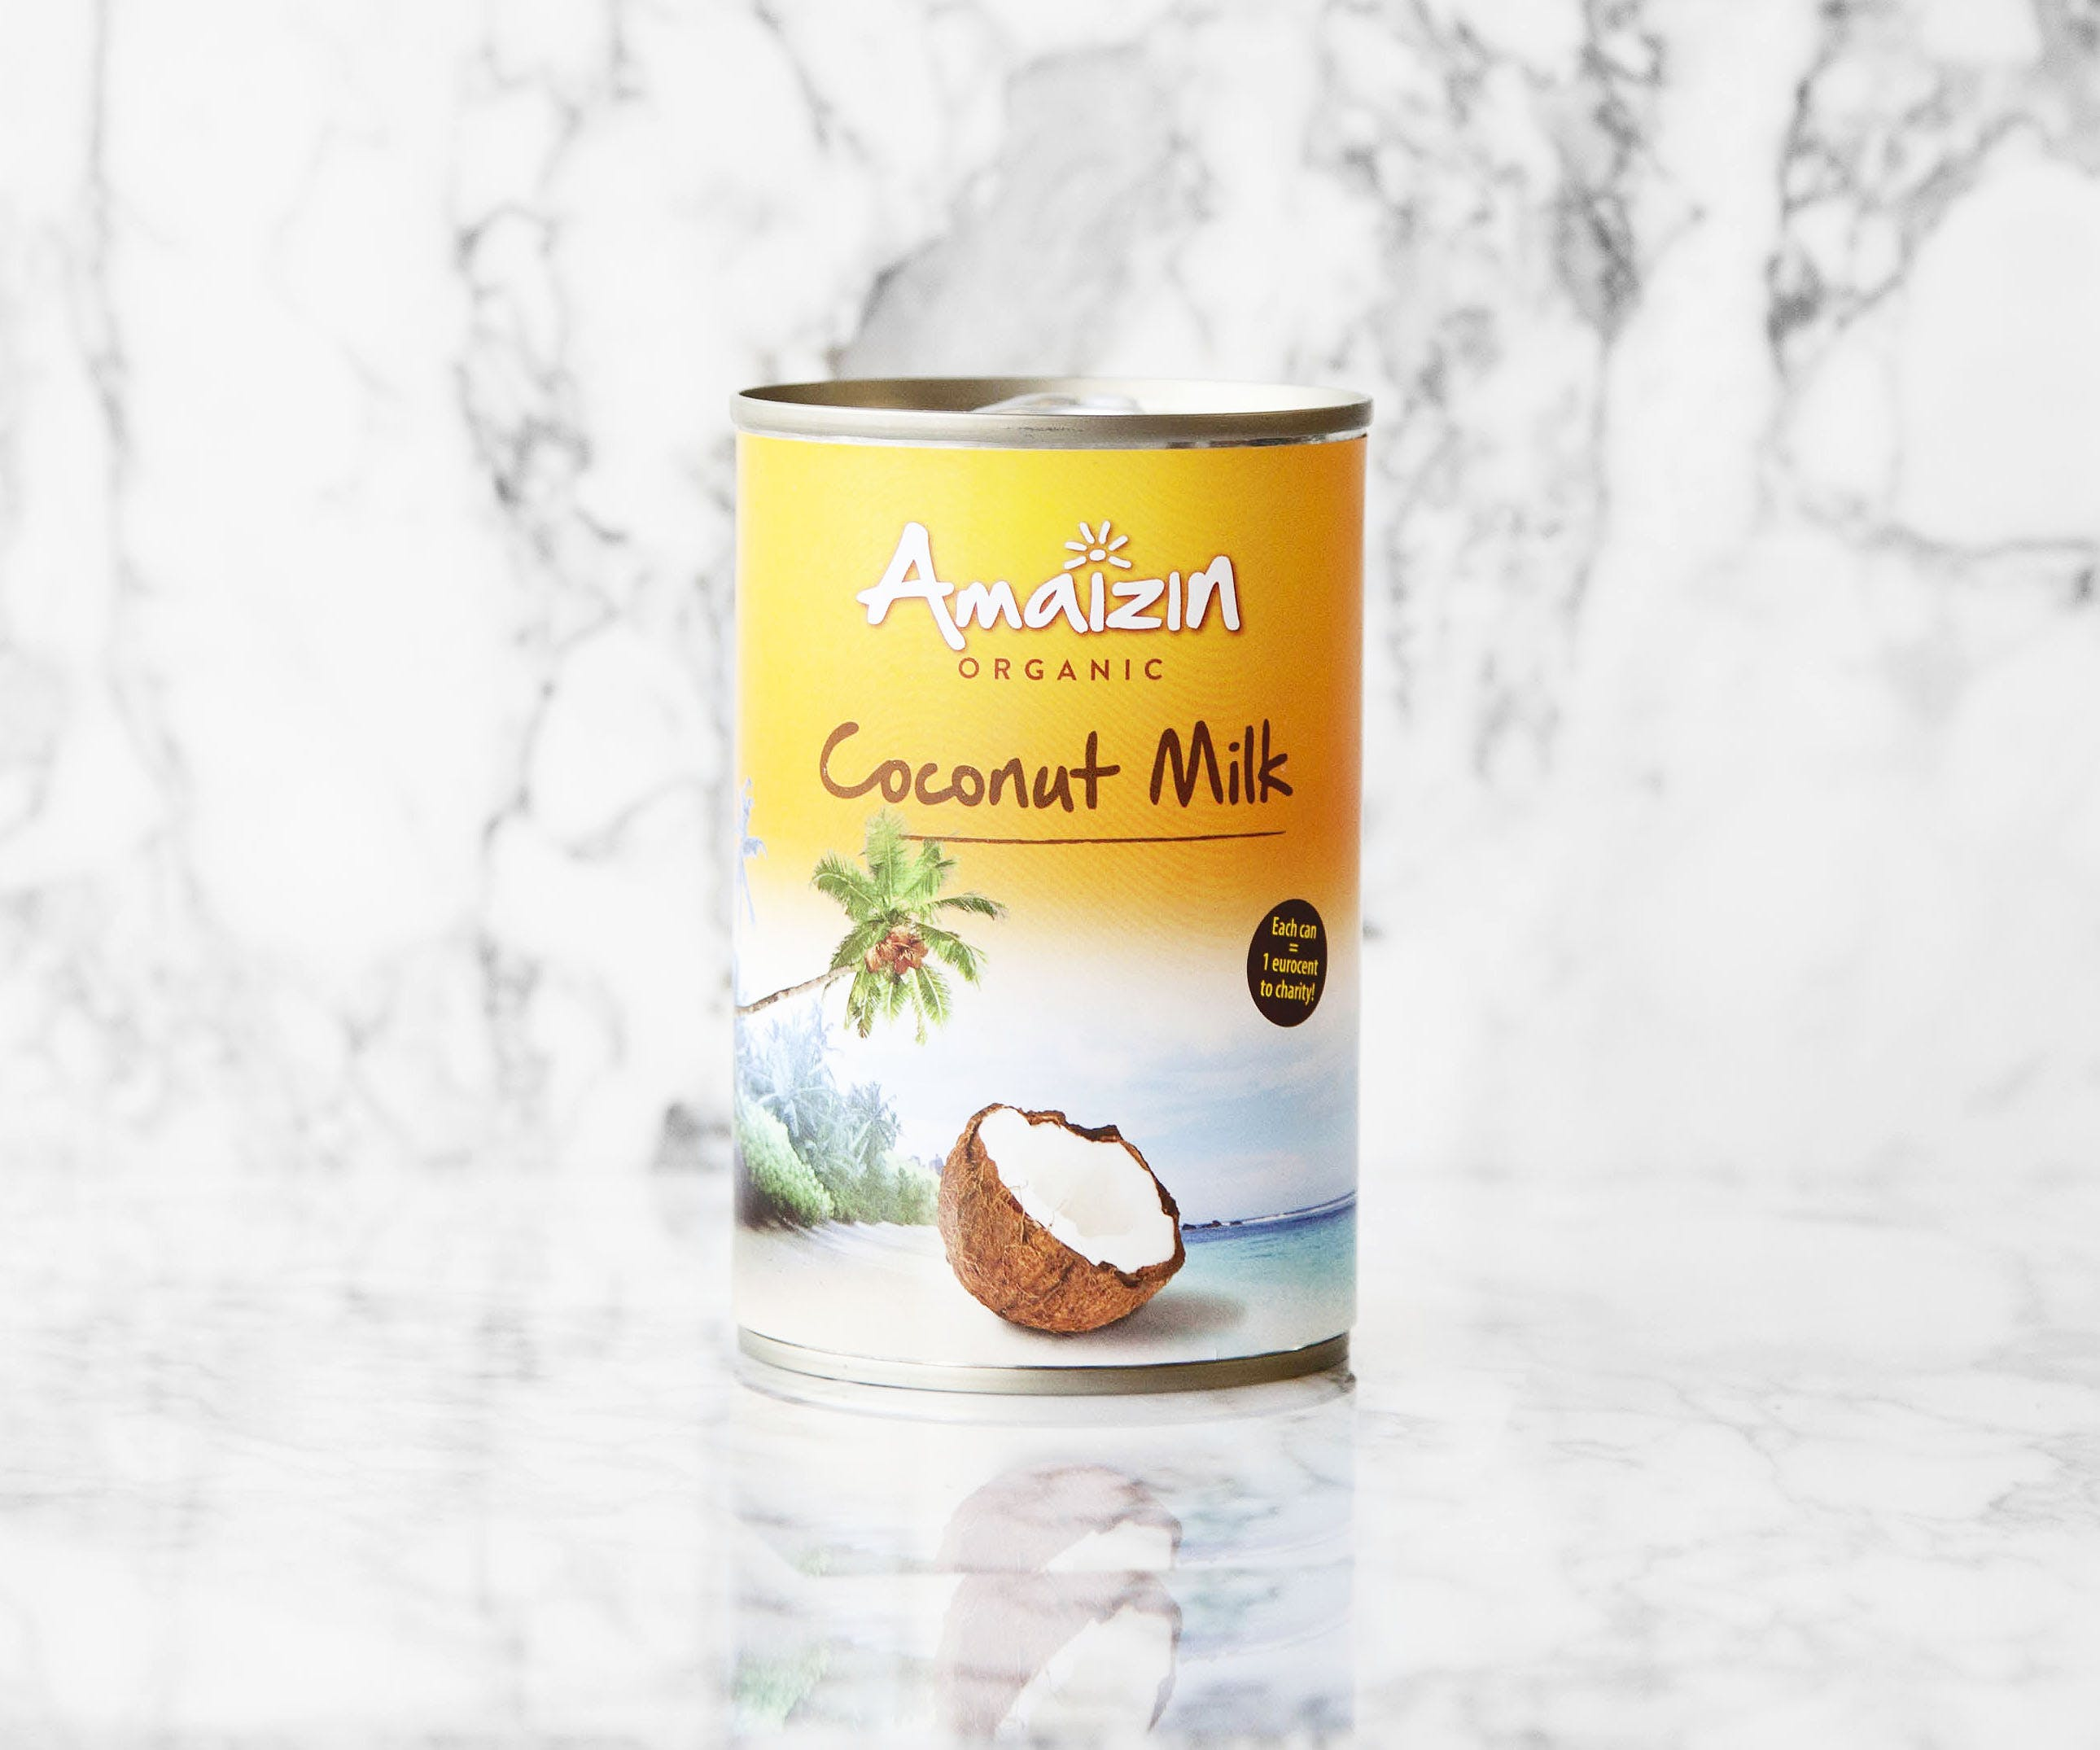 Amaizin Organic Rich Coconut Milk